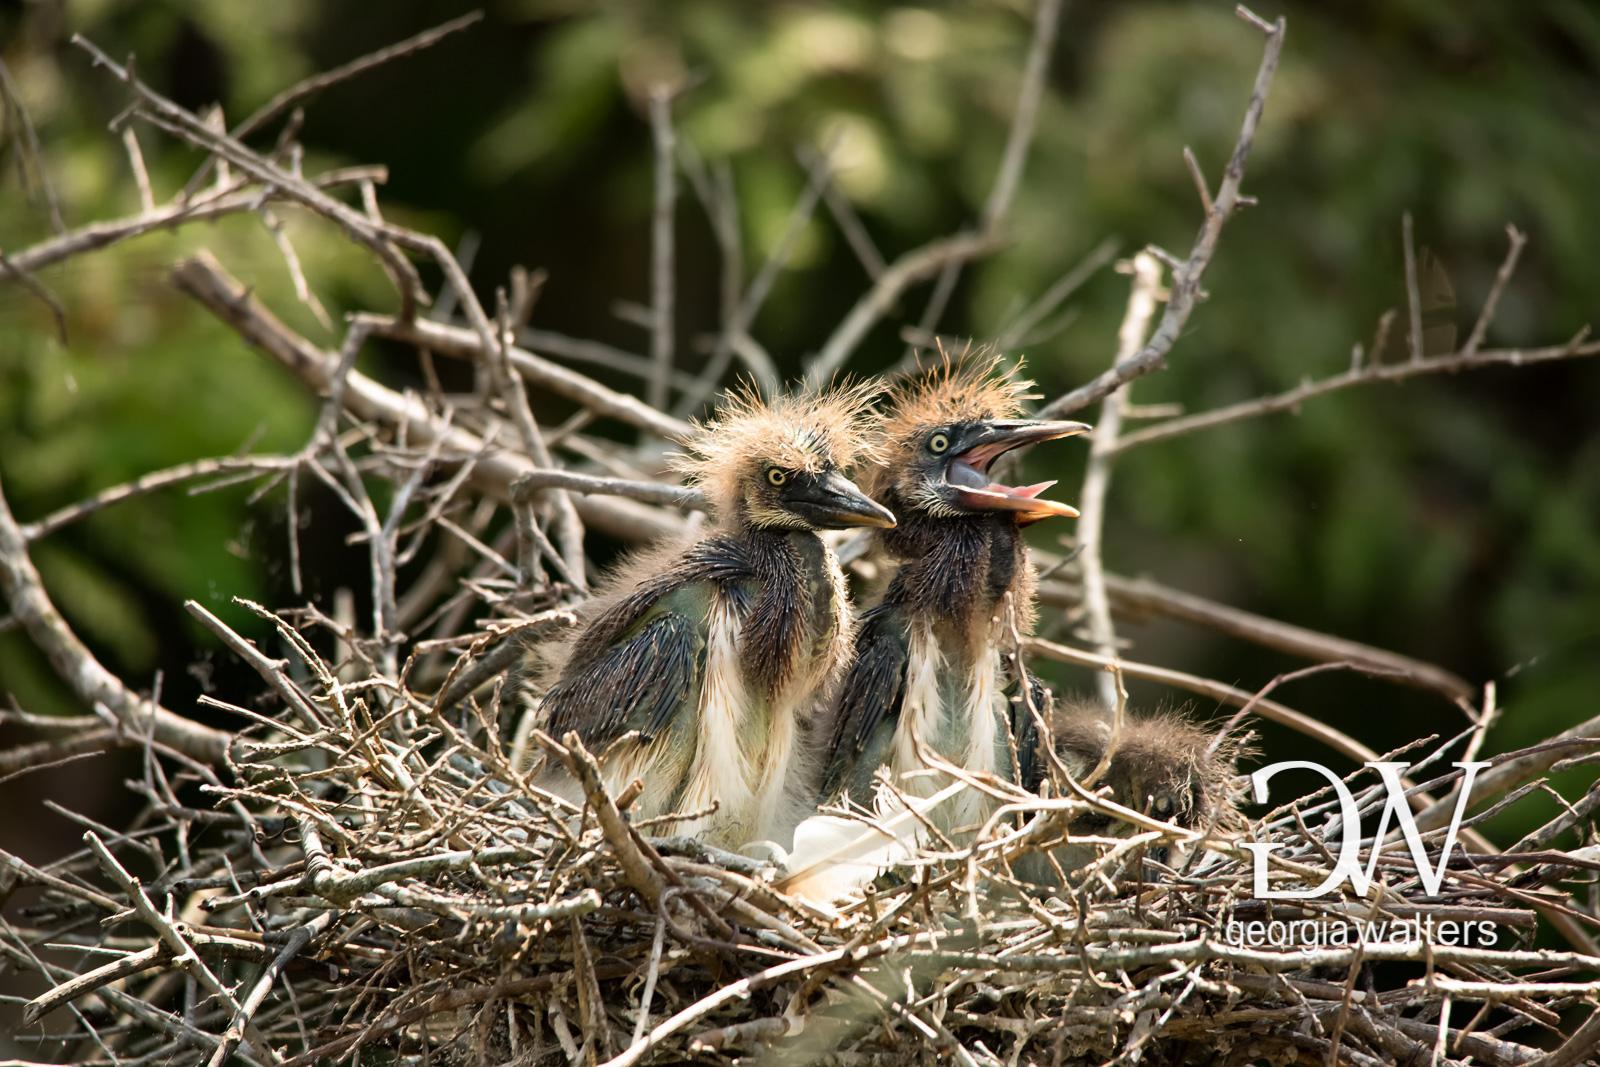 Tri-colored heron chicks call for mom.